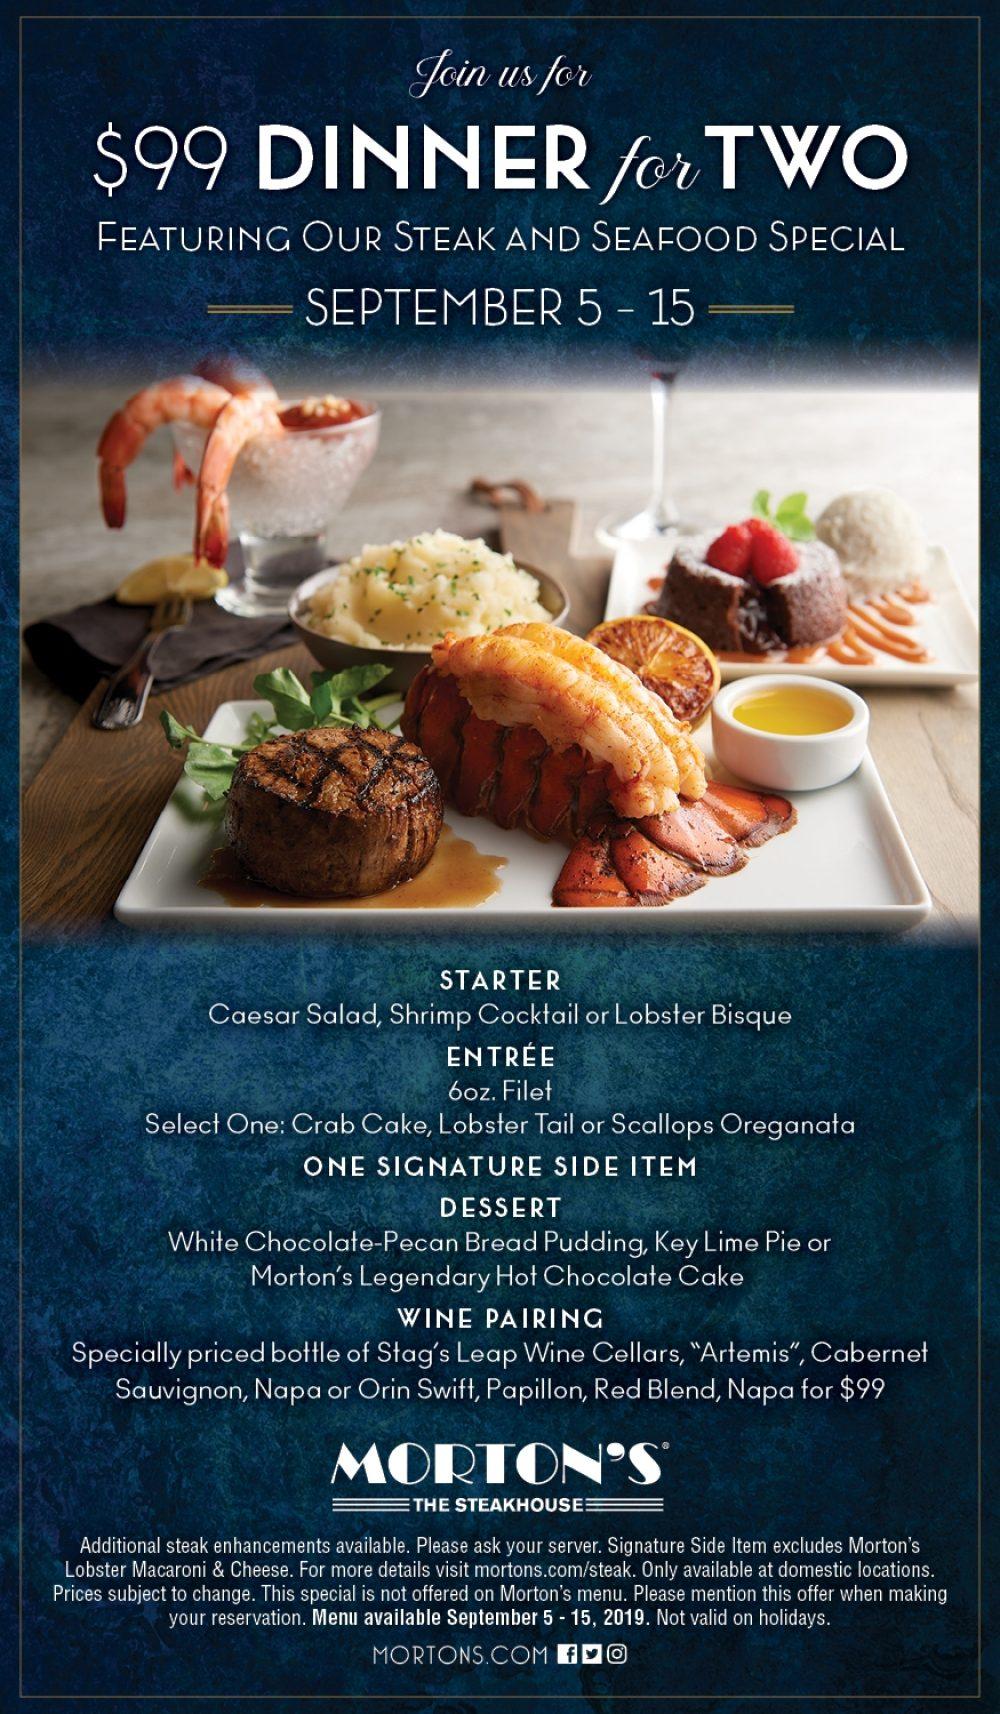 361880 Mrt Steak  Seafood Landing Page  Final